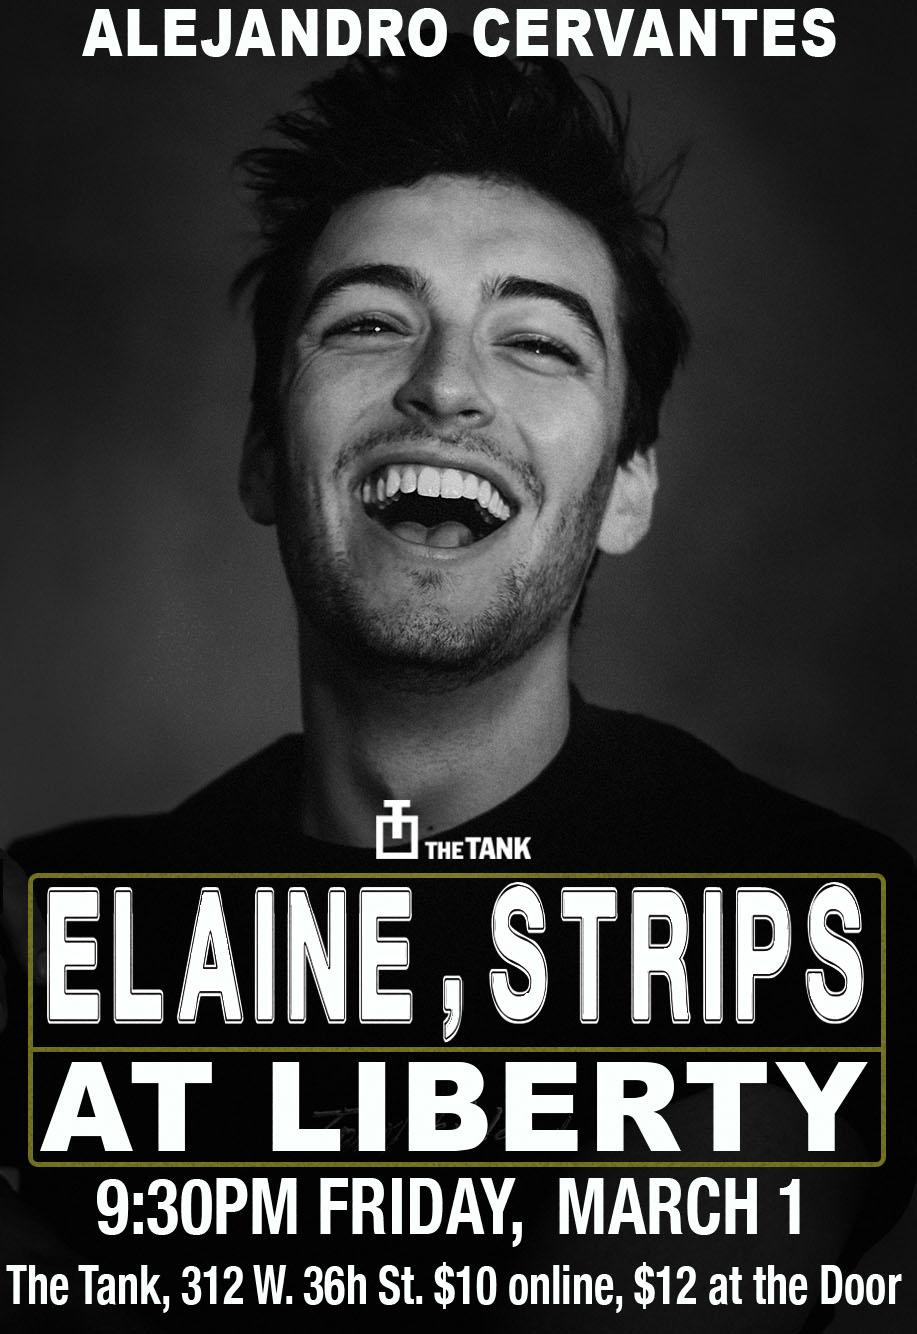 Elaine, Strips at Liberty Poster 2.jpg